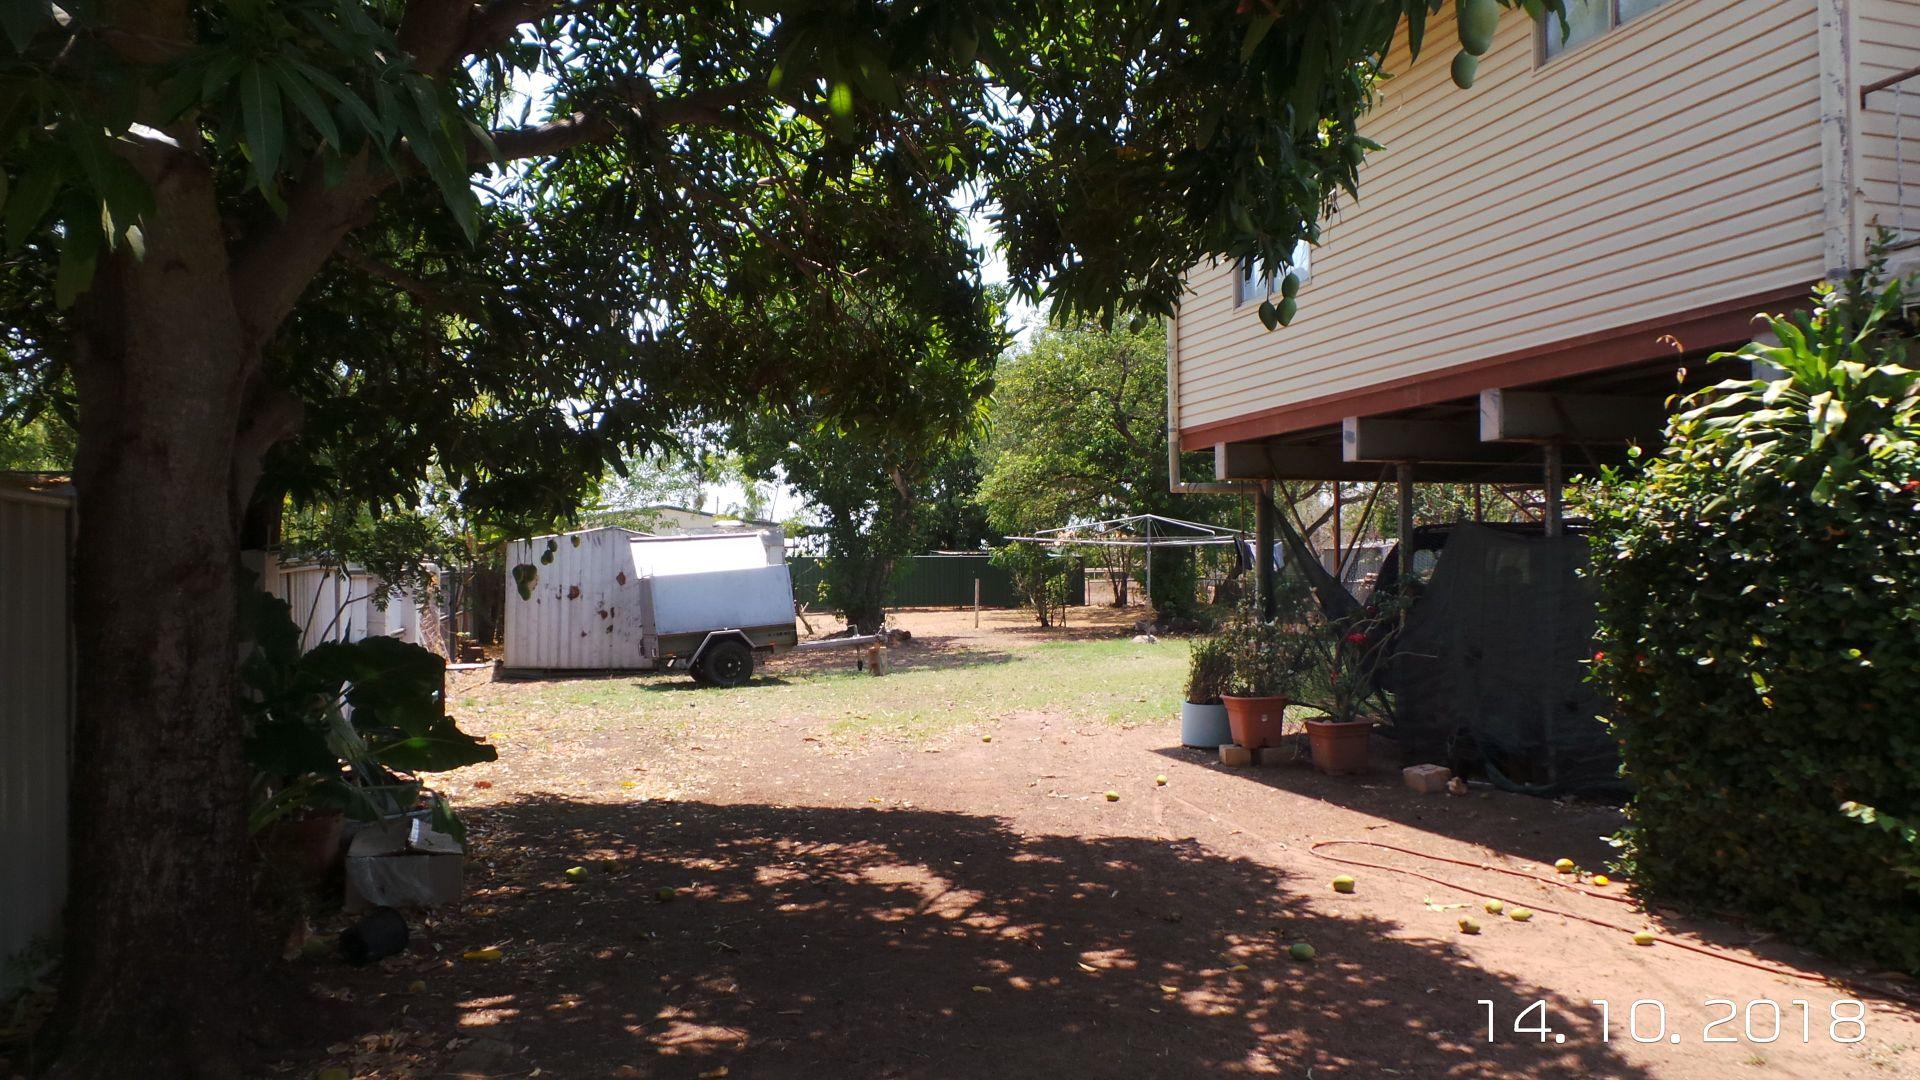 Normanton QLD 4890, Image 1